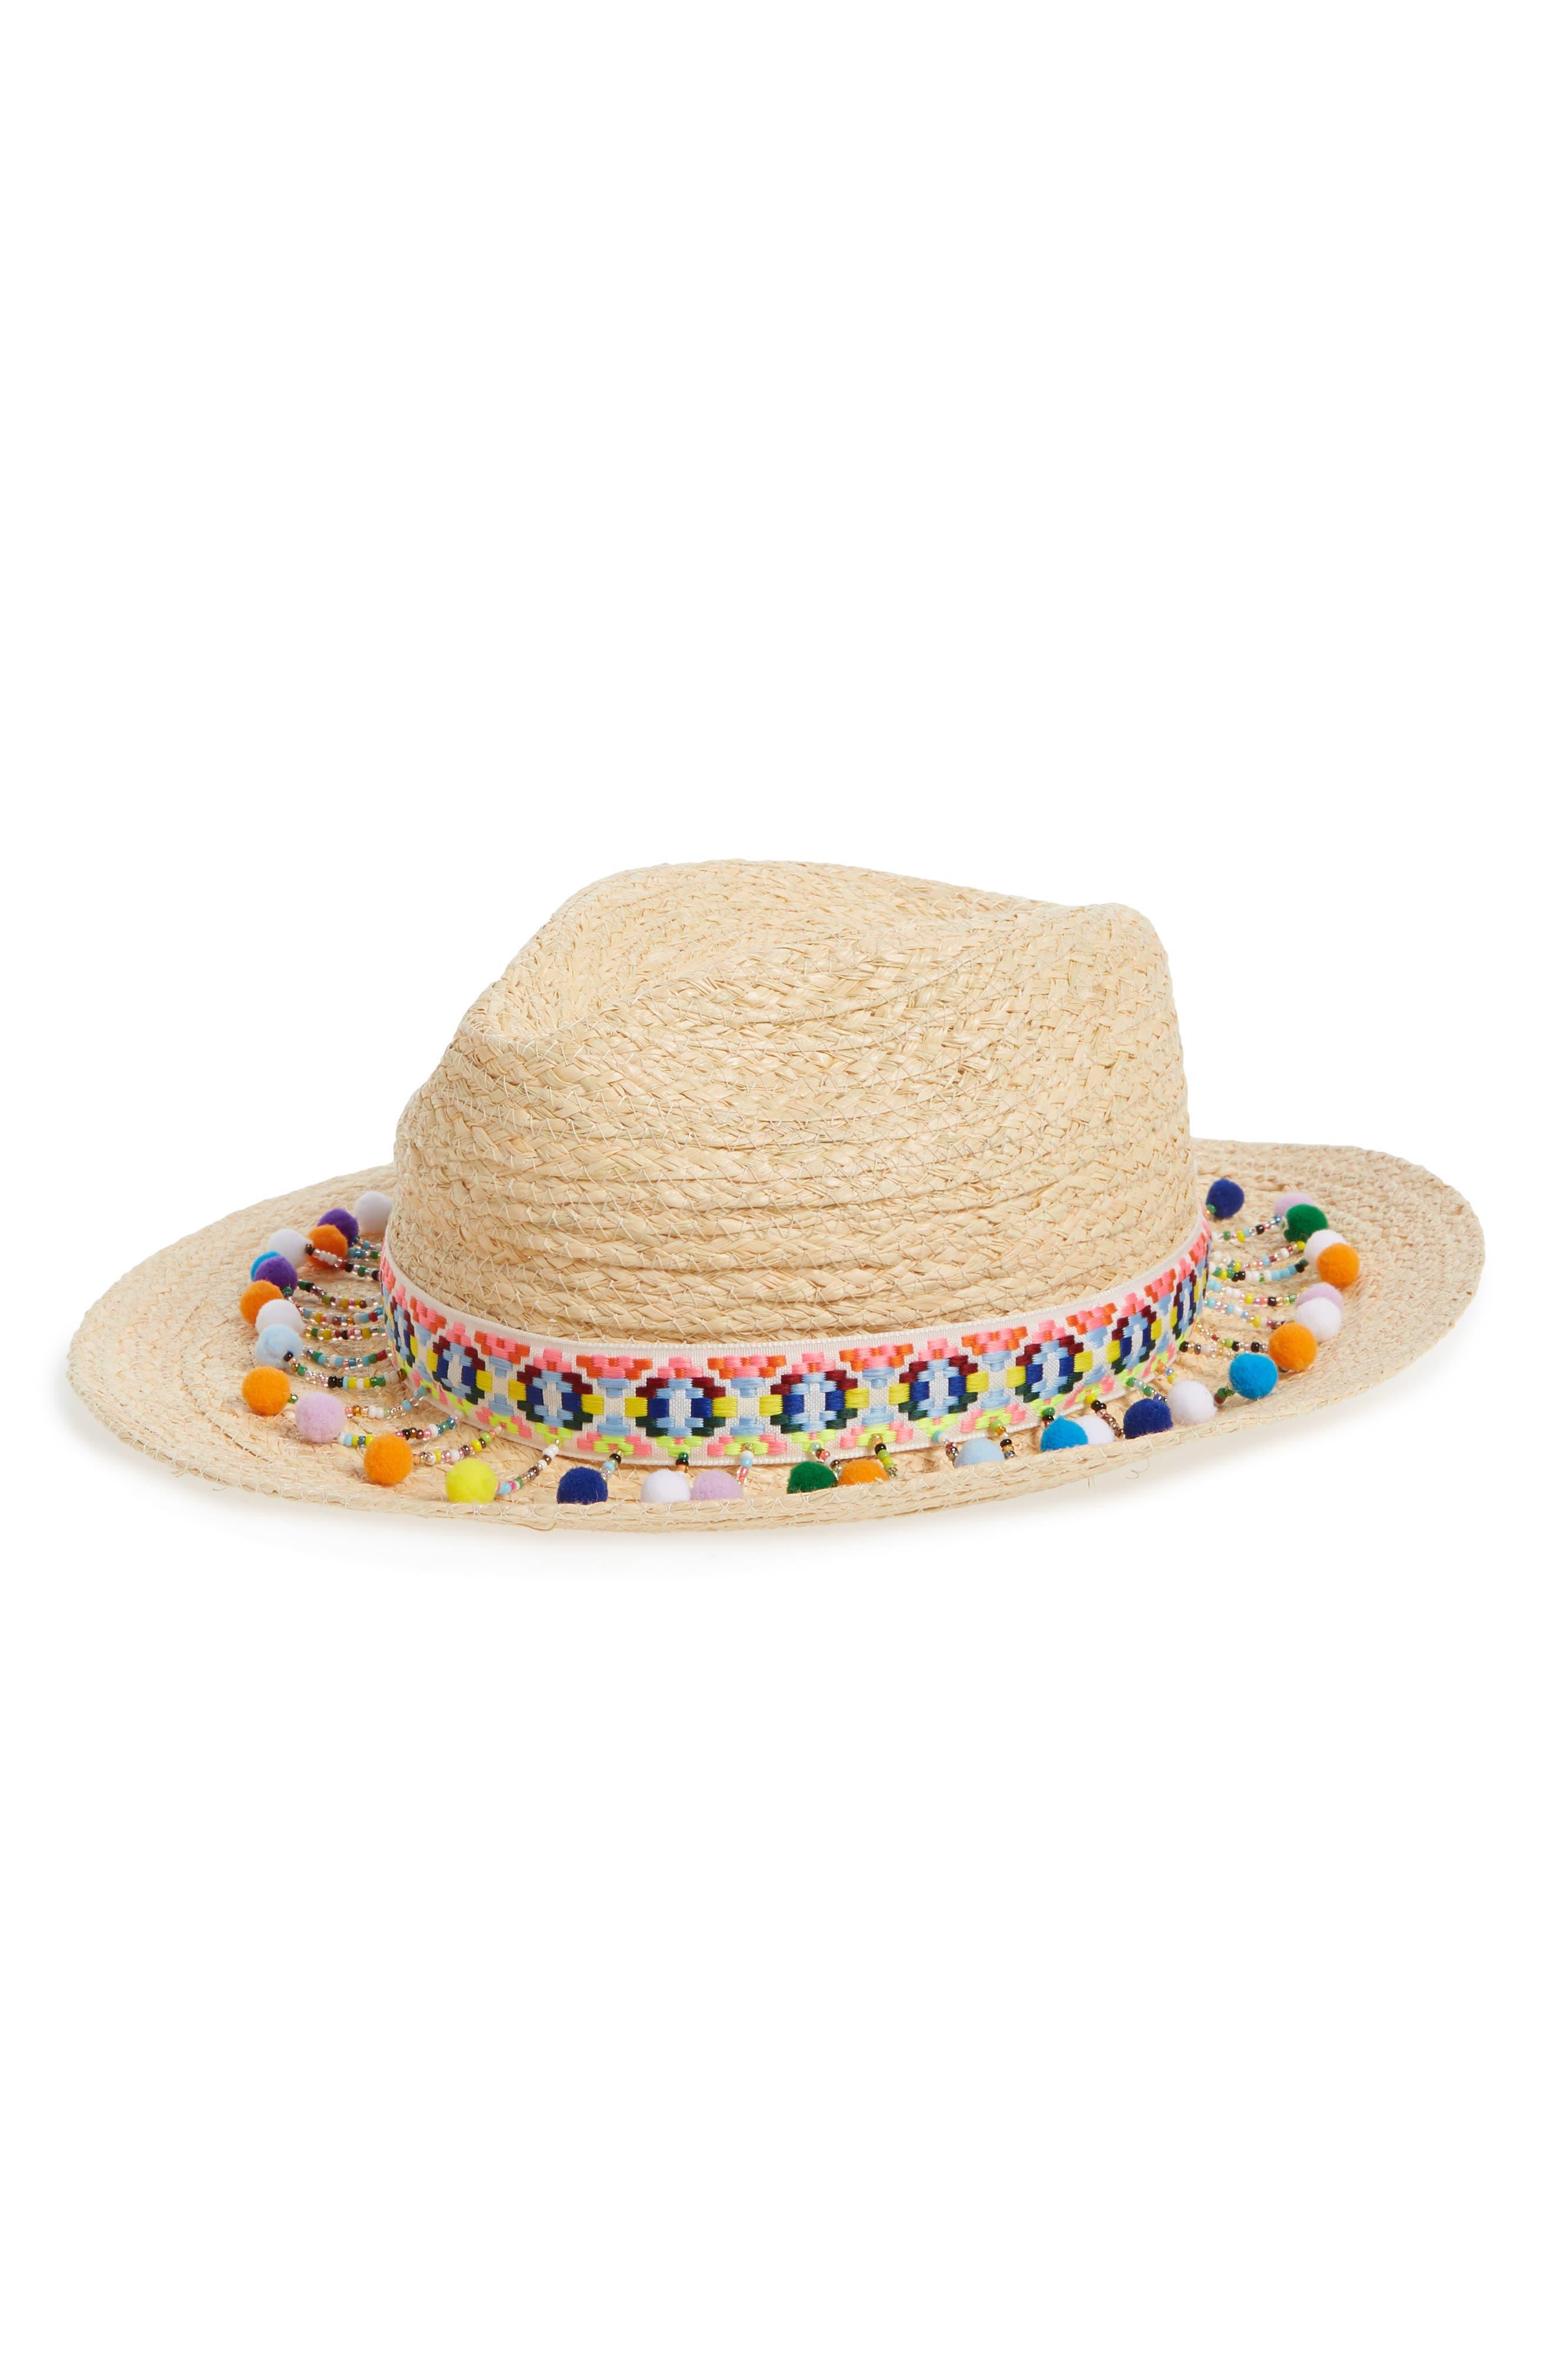 Beaded Pompom Trim Panama Hat,                             Main thumbnail 1, color,                             235